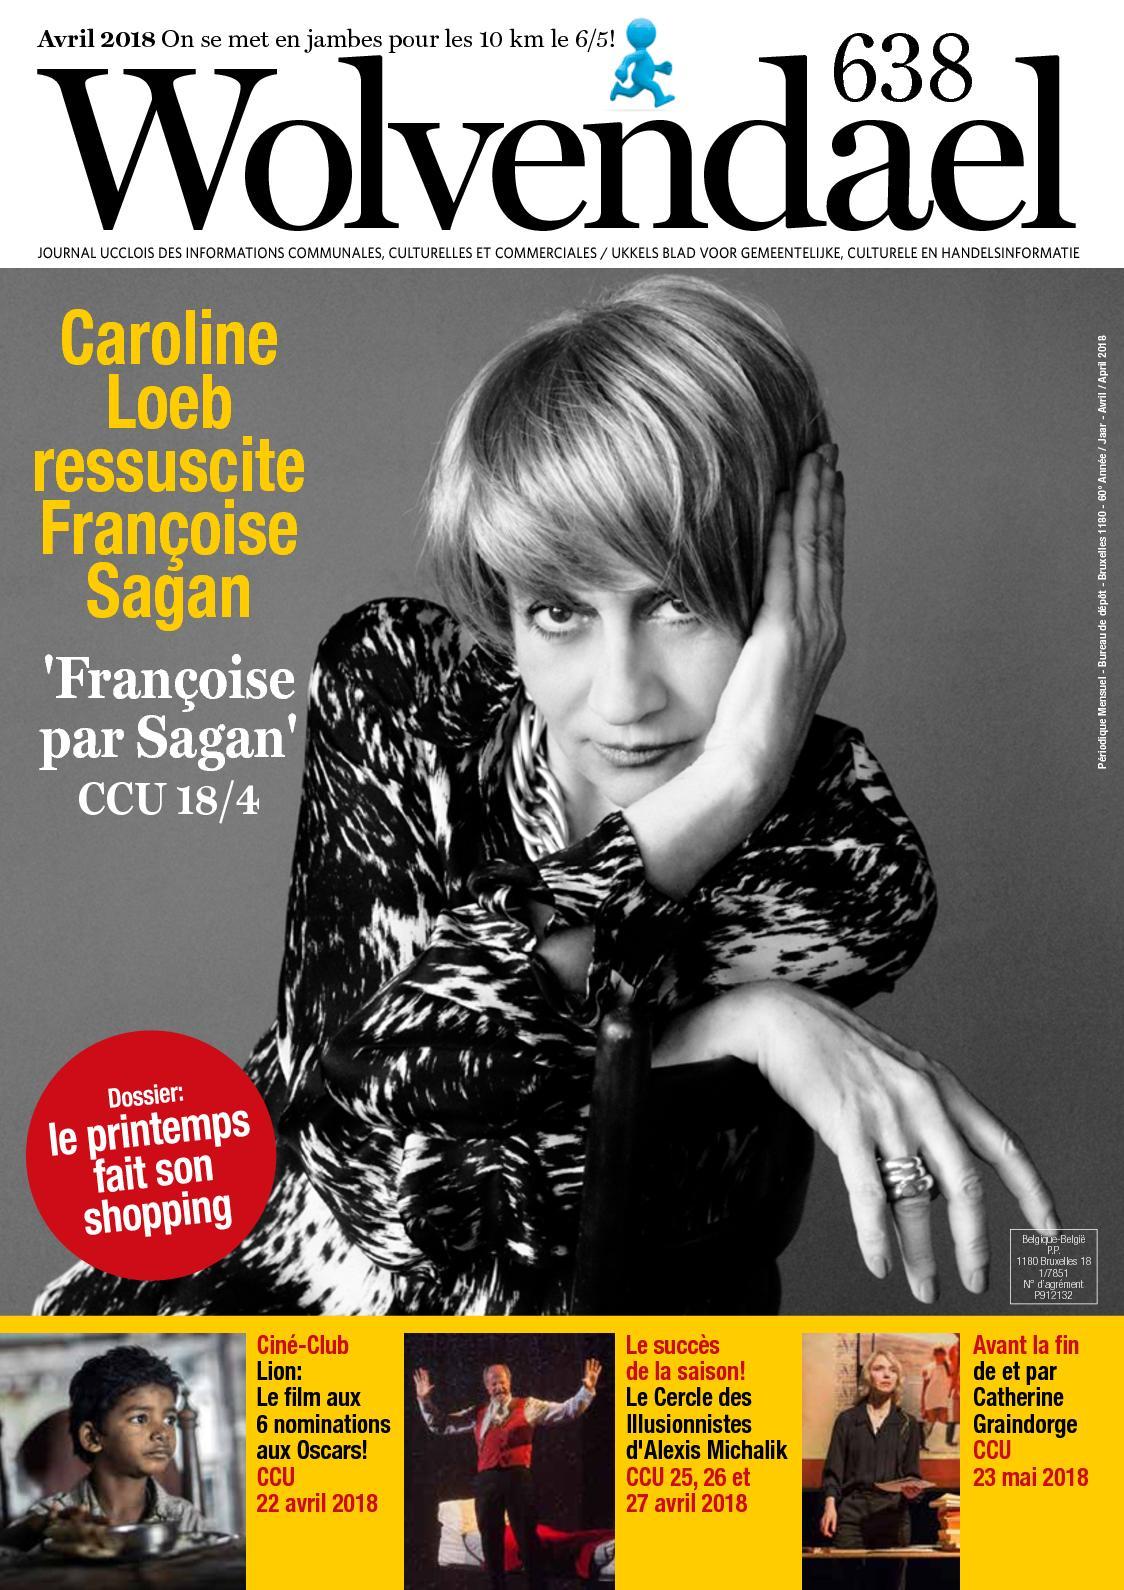 Calaméo - Wolvendael magazine n° 638 avril 2018 7cf9ccde178